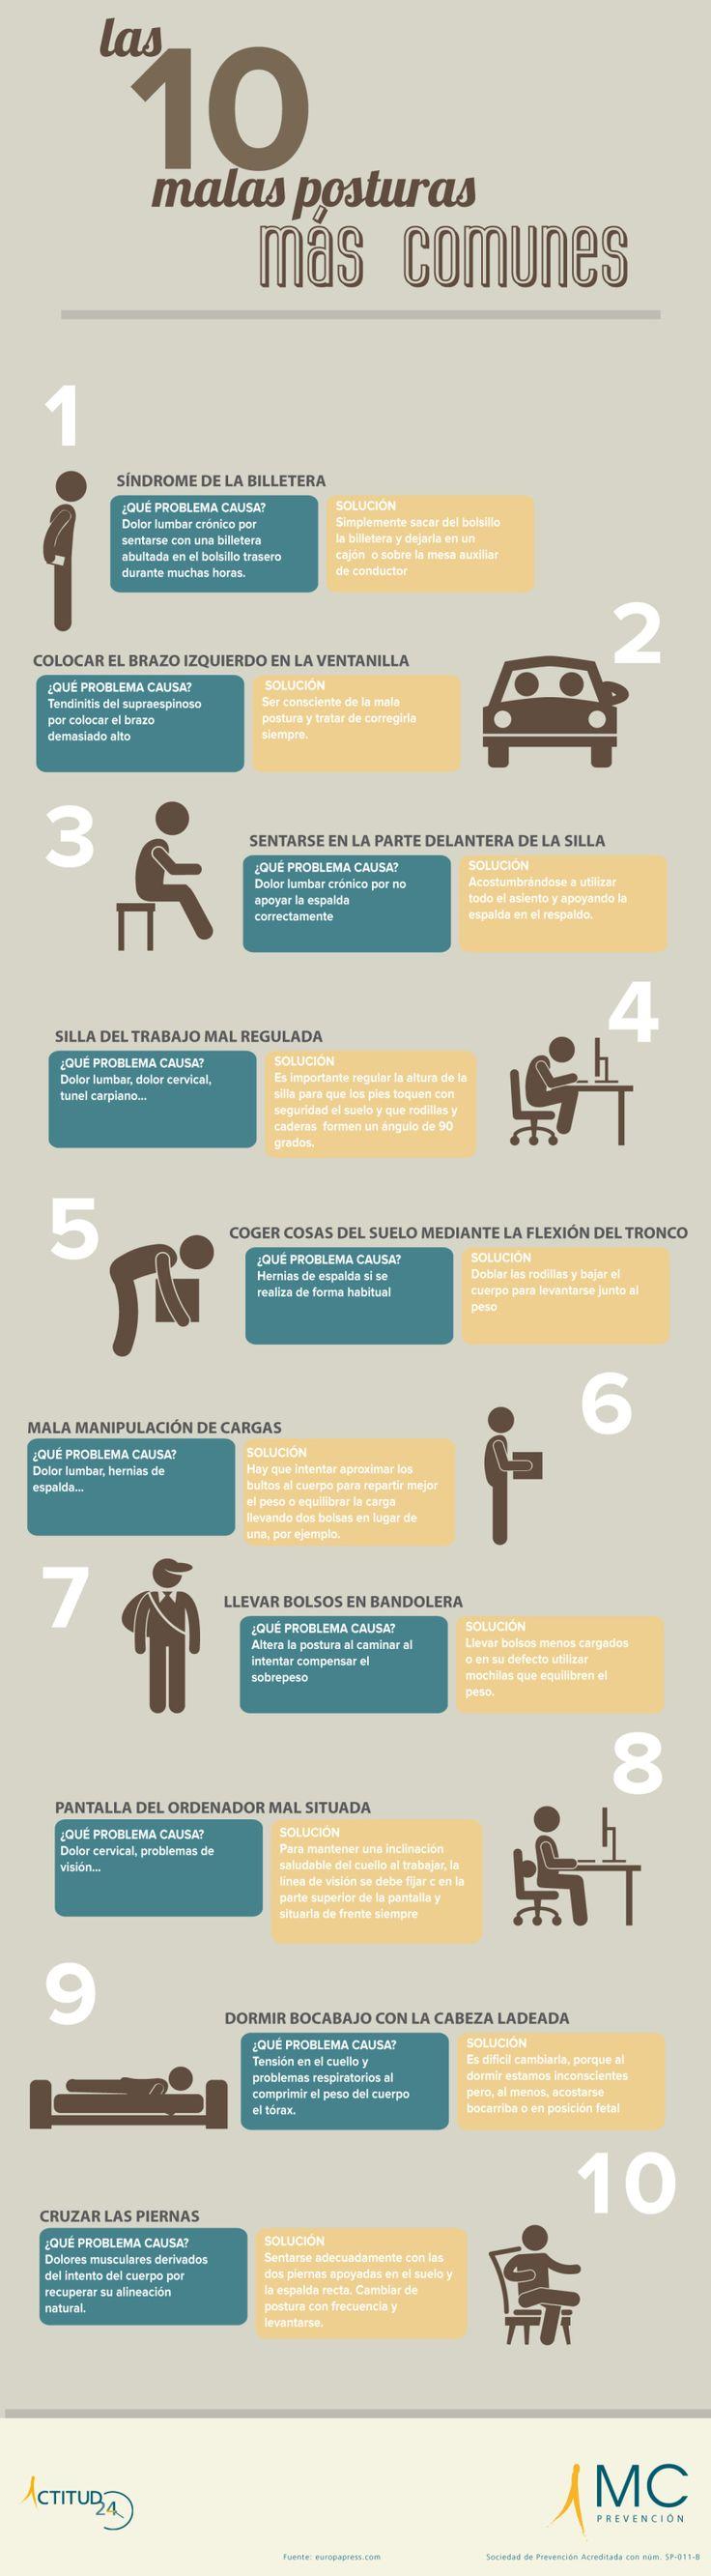 10 malas postura que producen dolores musculares